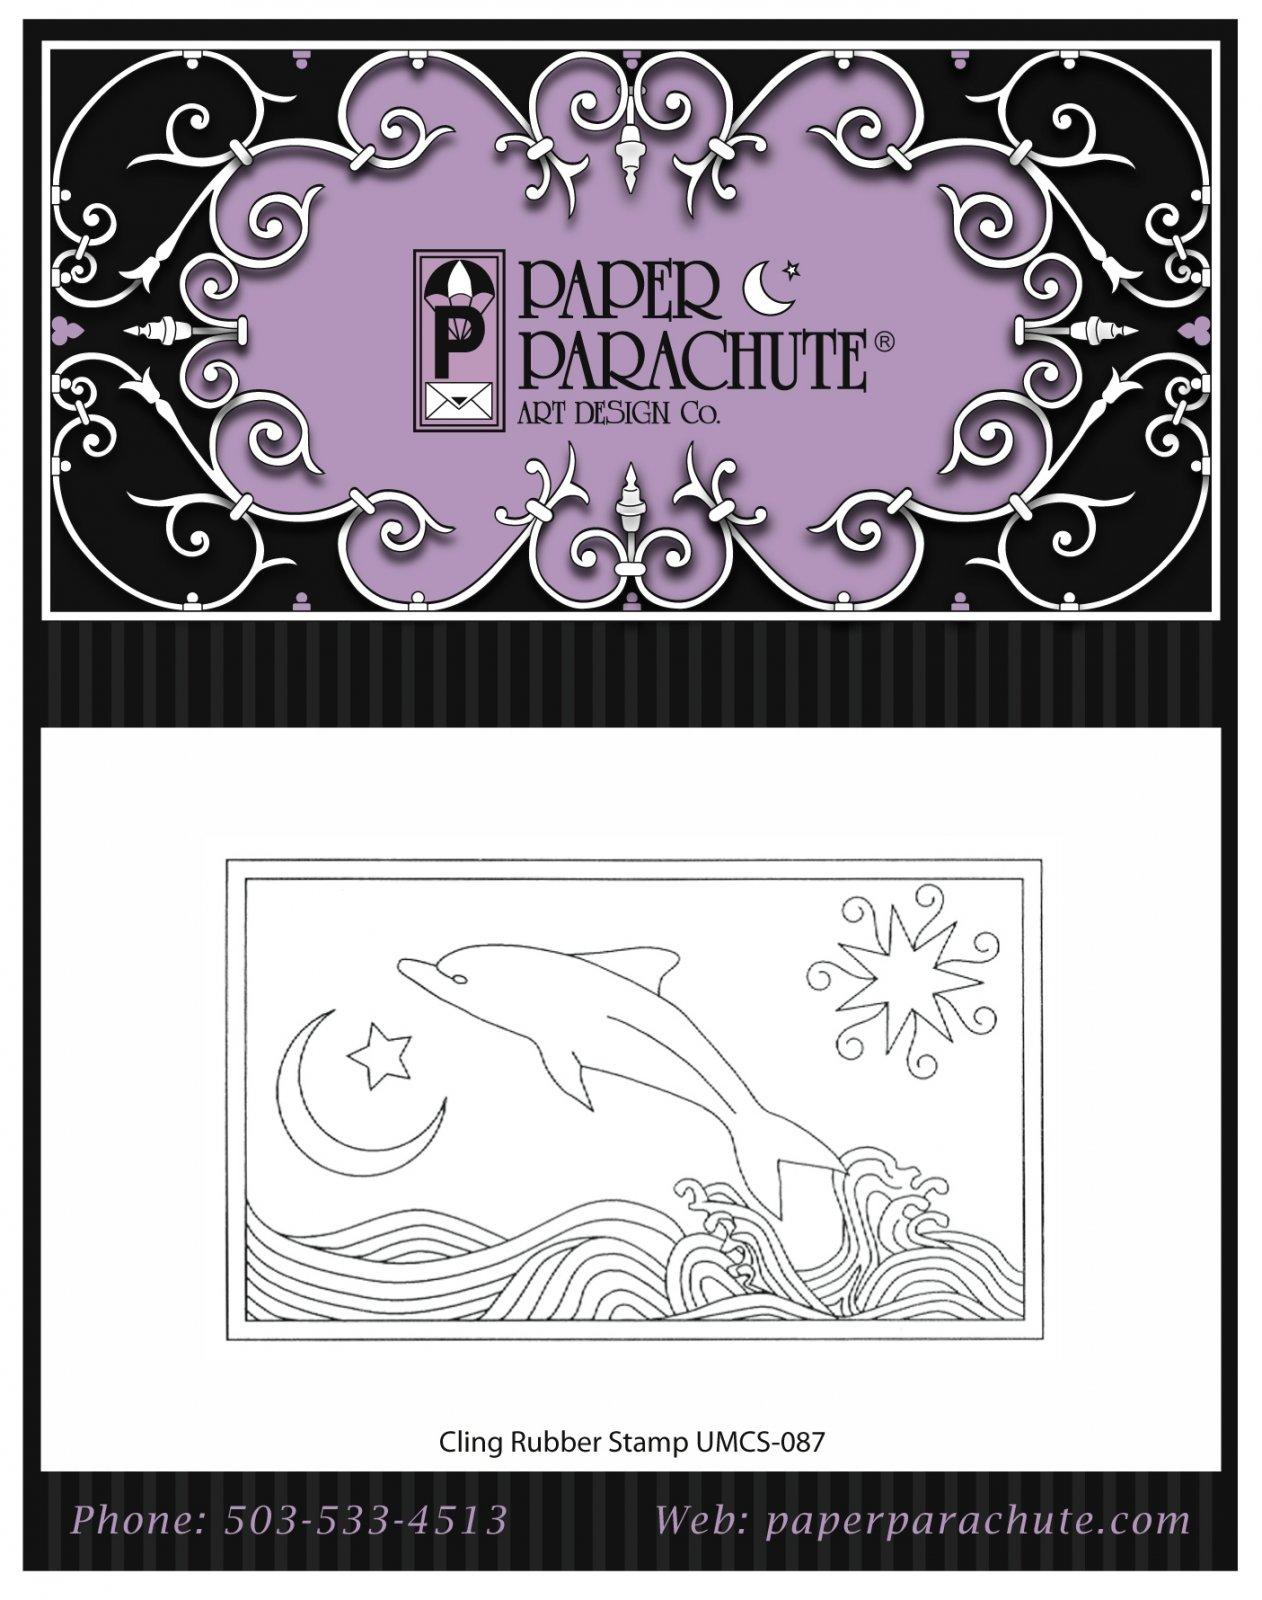 Paper Parachute Rubber Stamp - UMCS87